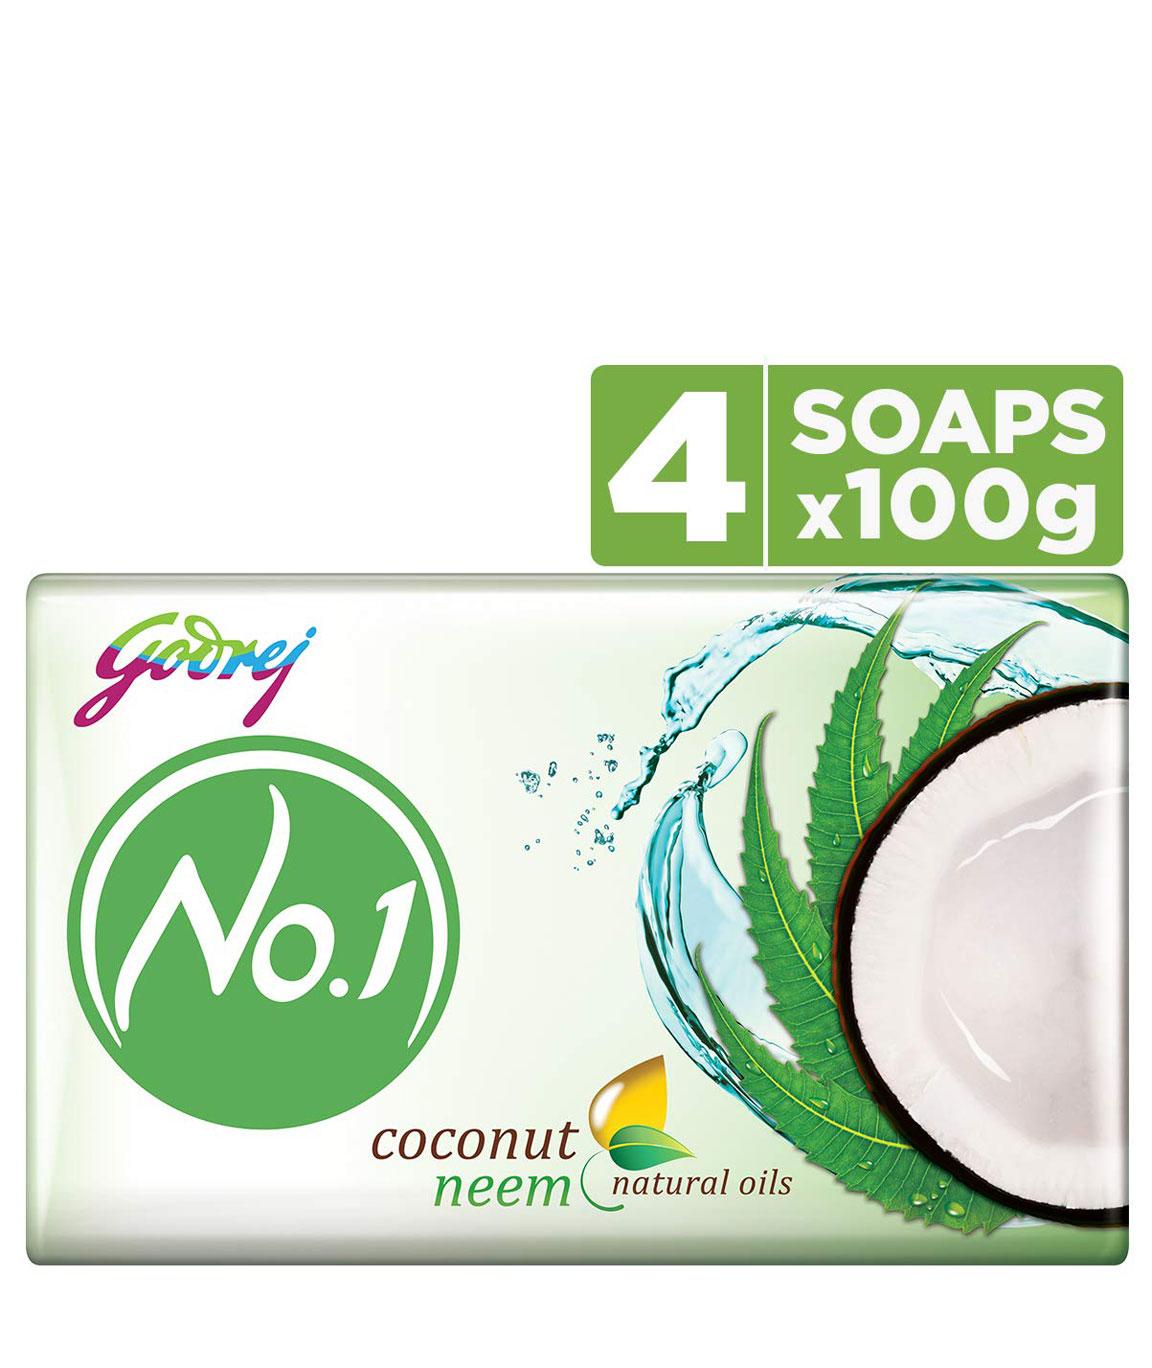 Godrej No.1 Bathing Soap  Coconut & Neem Soap, 100g (Pack of 4)